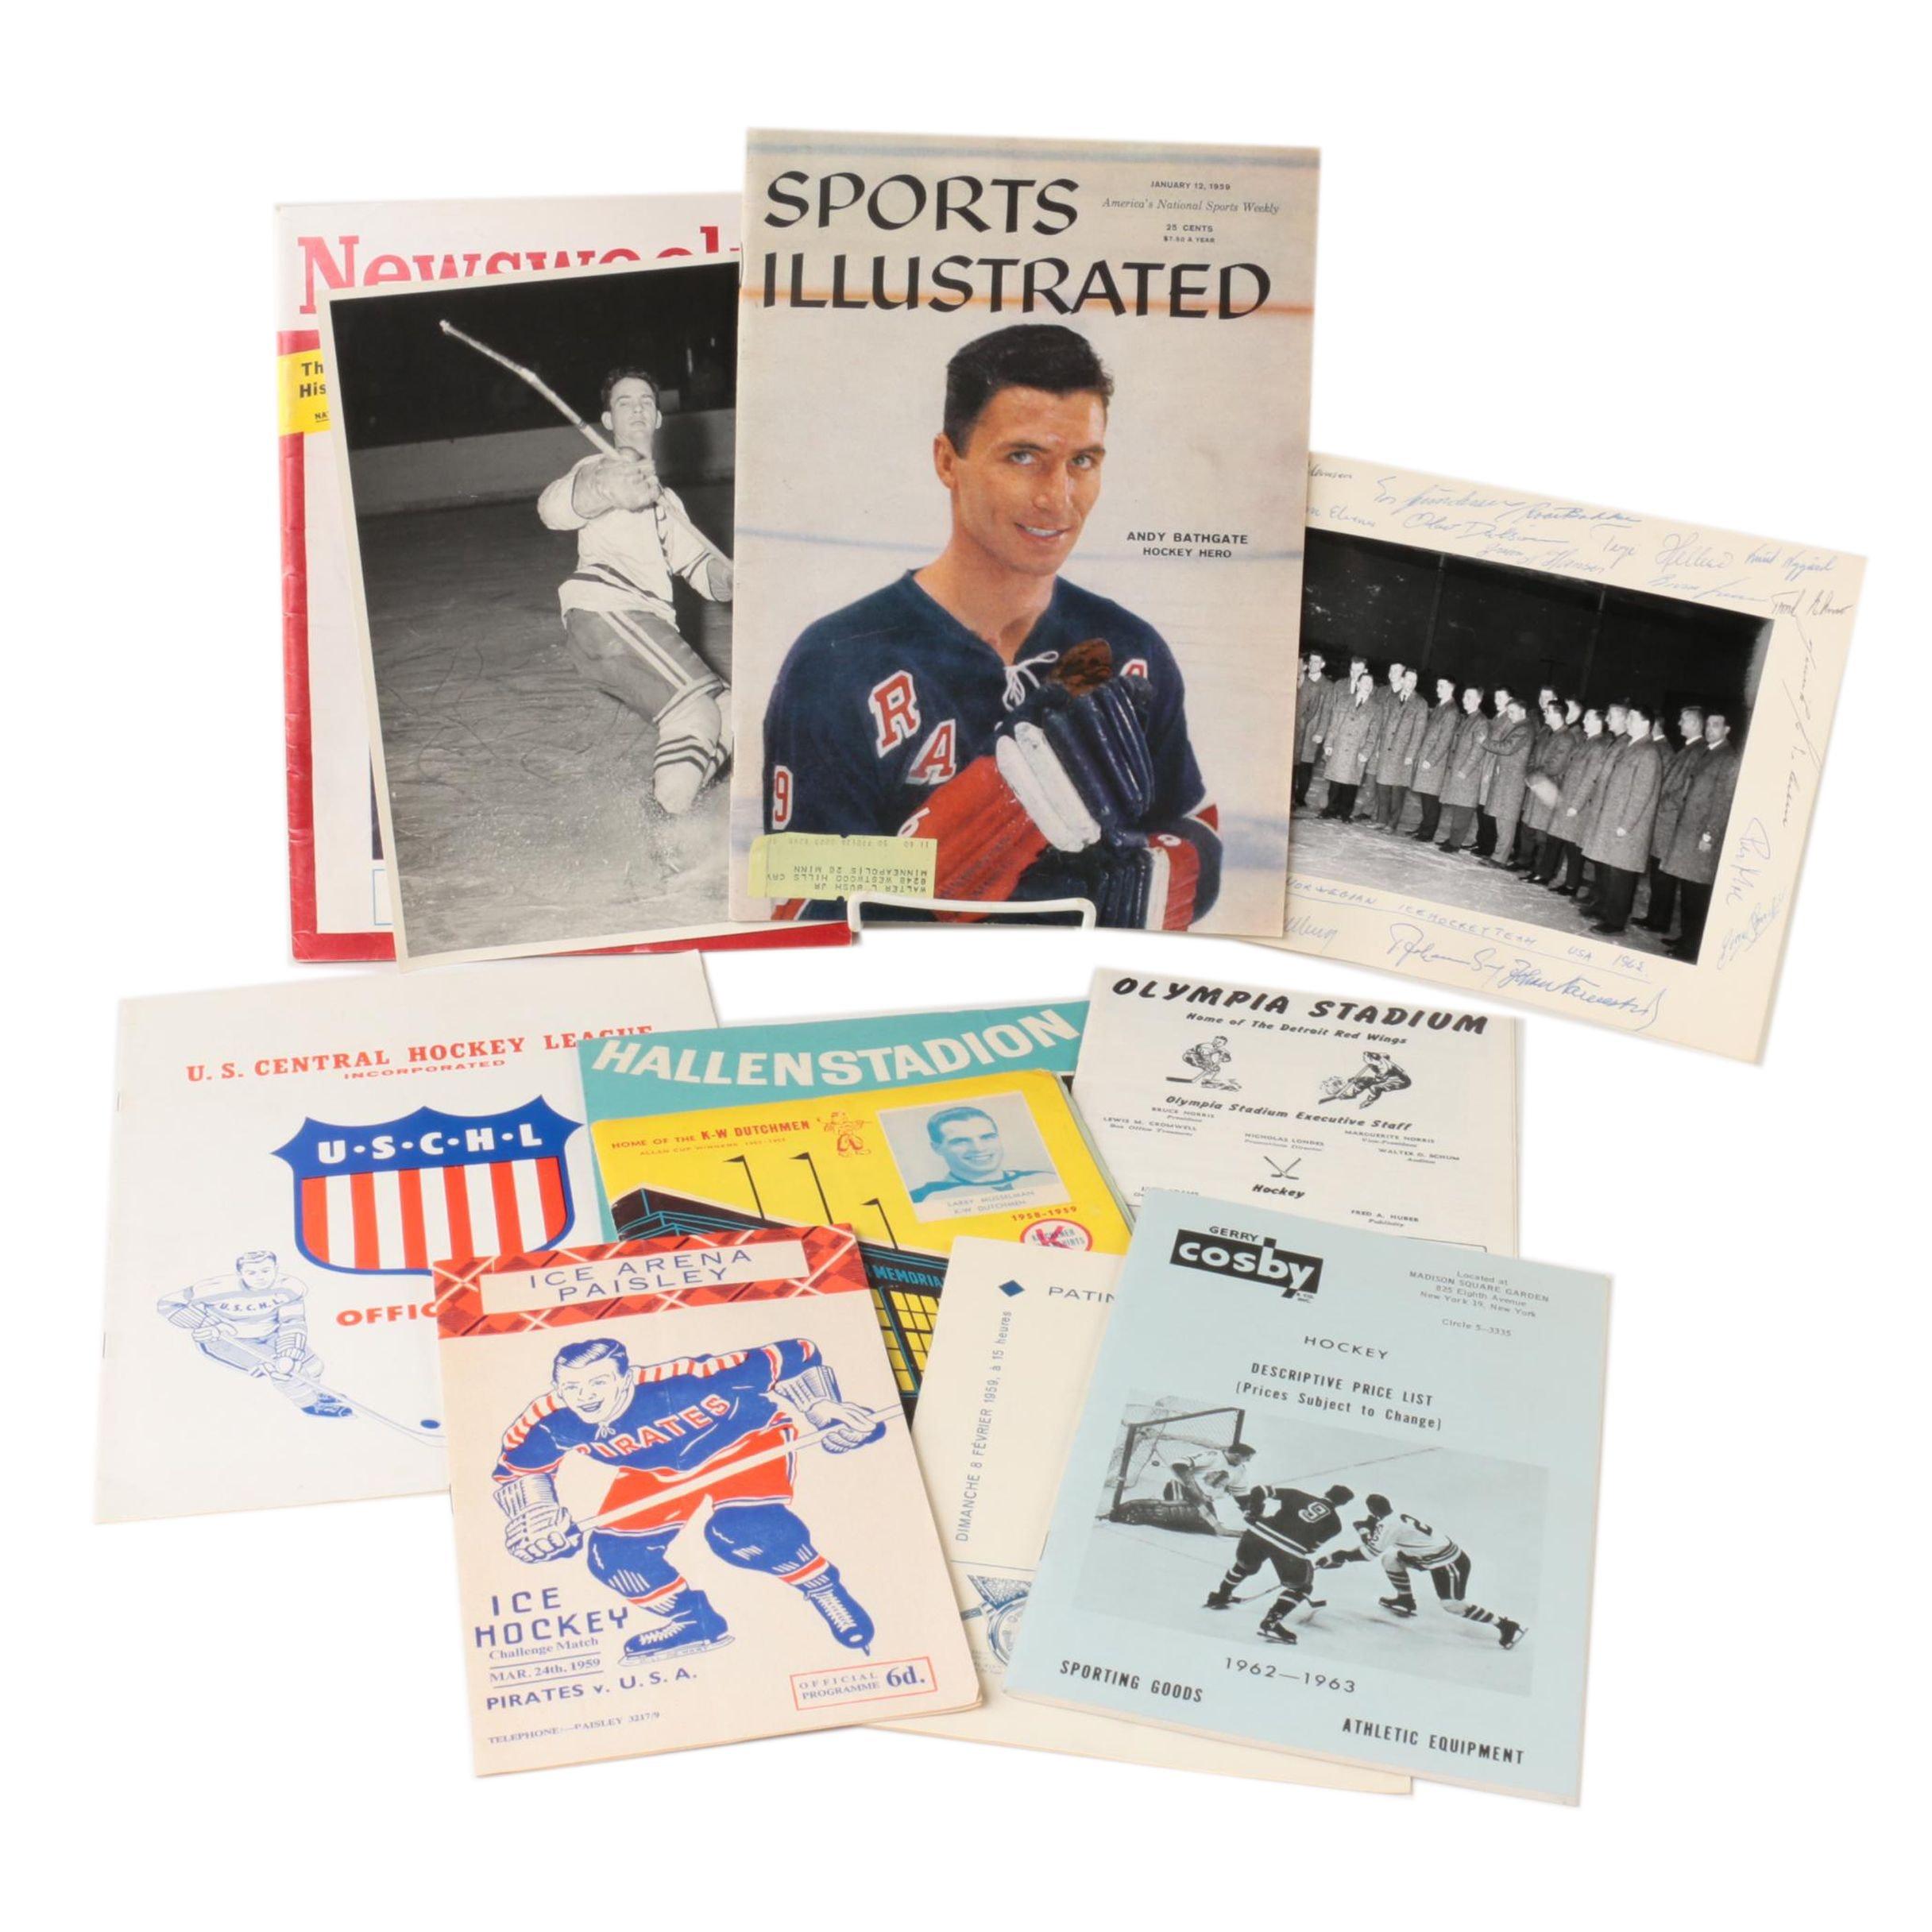 Signed Photo of the 1962 Men's Norwegian Ice Hockey Team and Ephemera